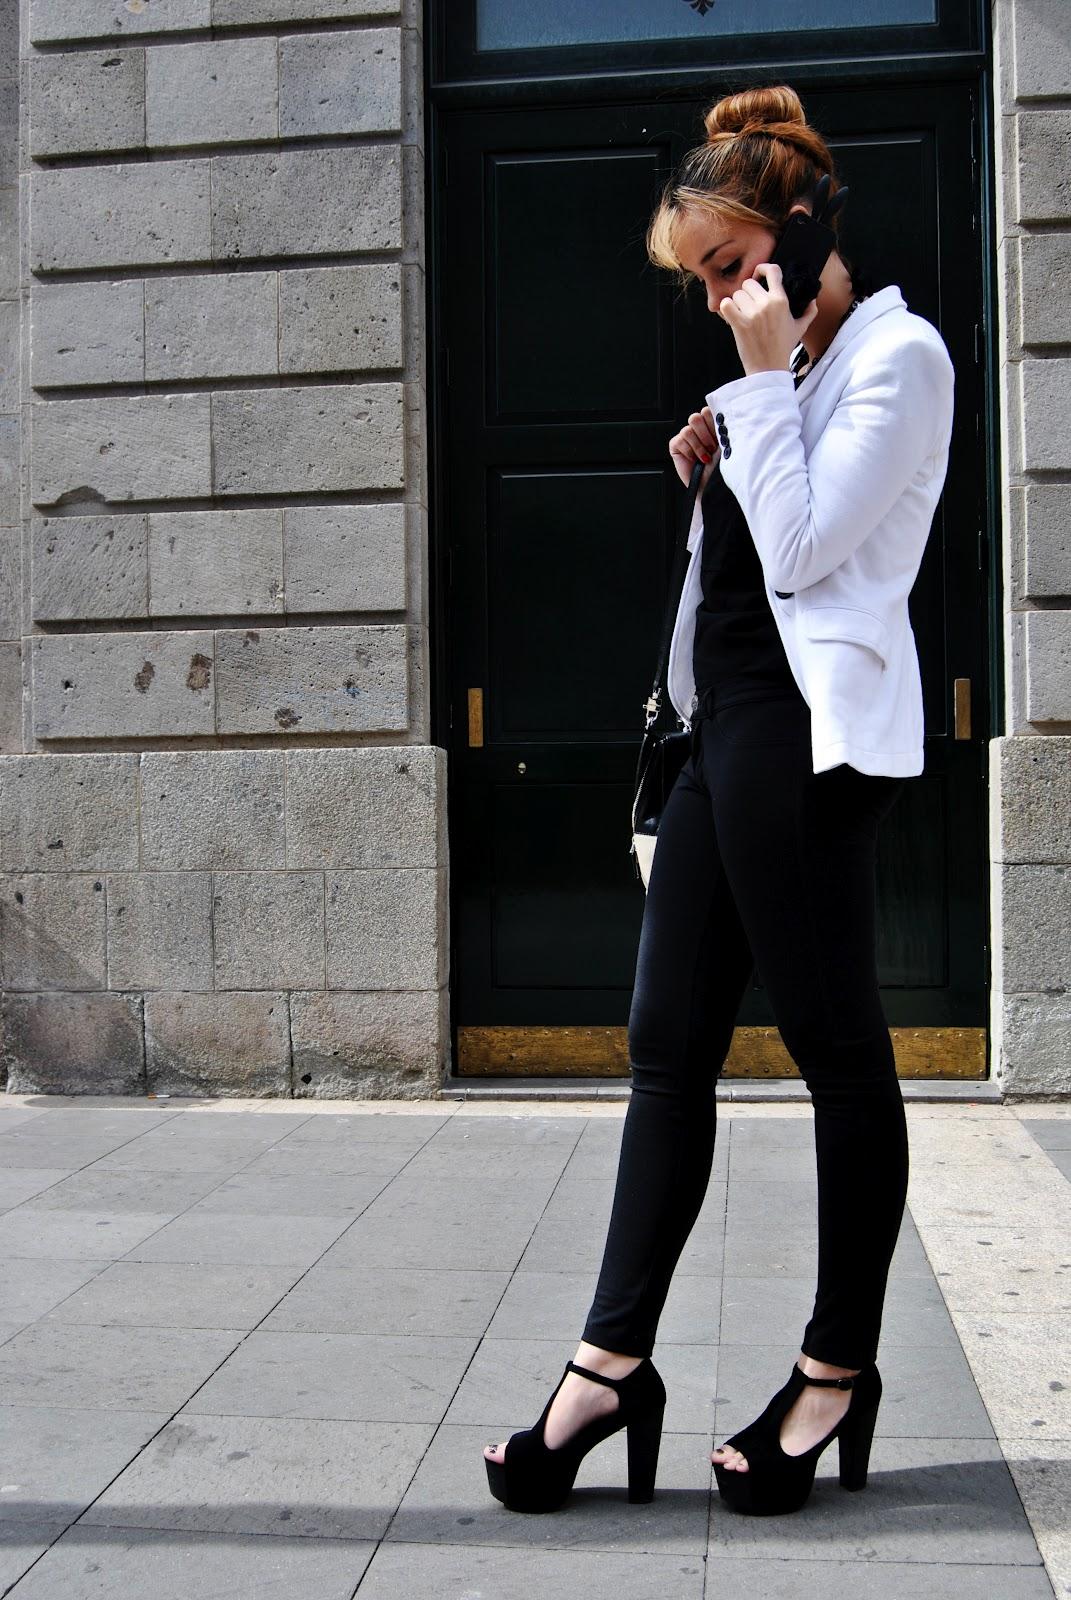 nery hdez, iphone case, leggins, white blazer, bussines look